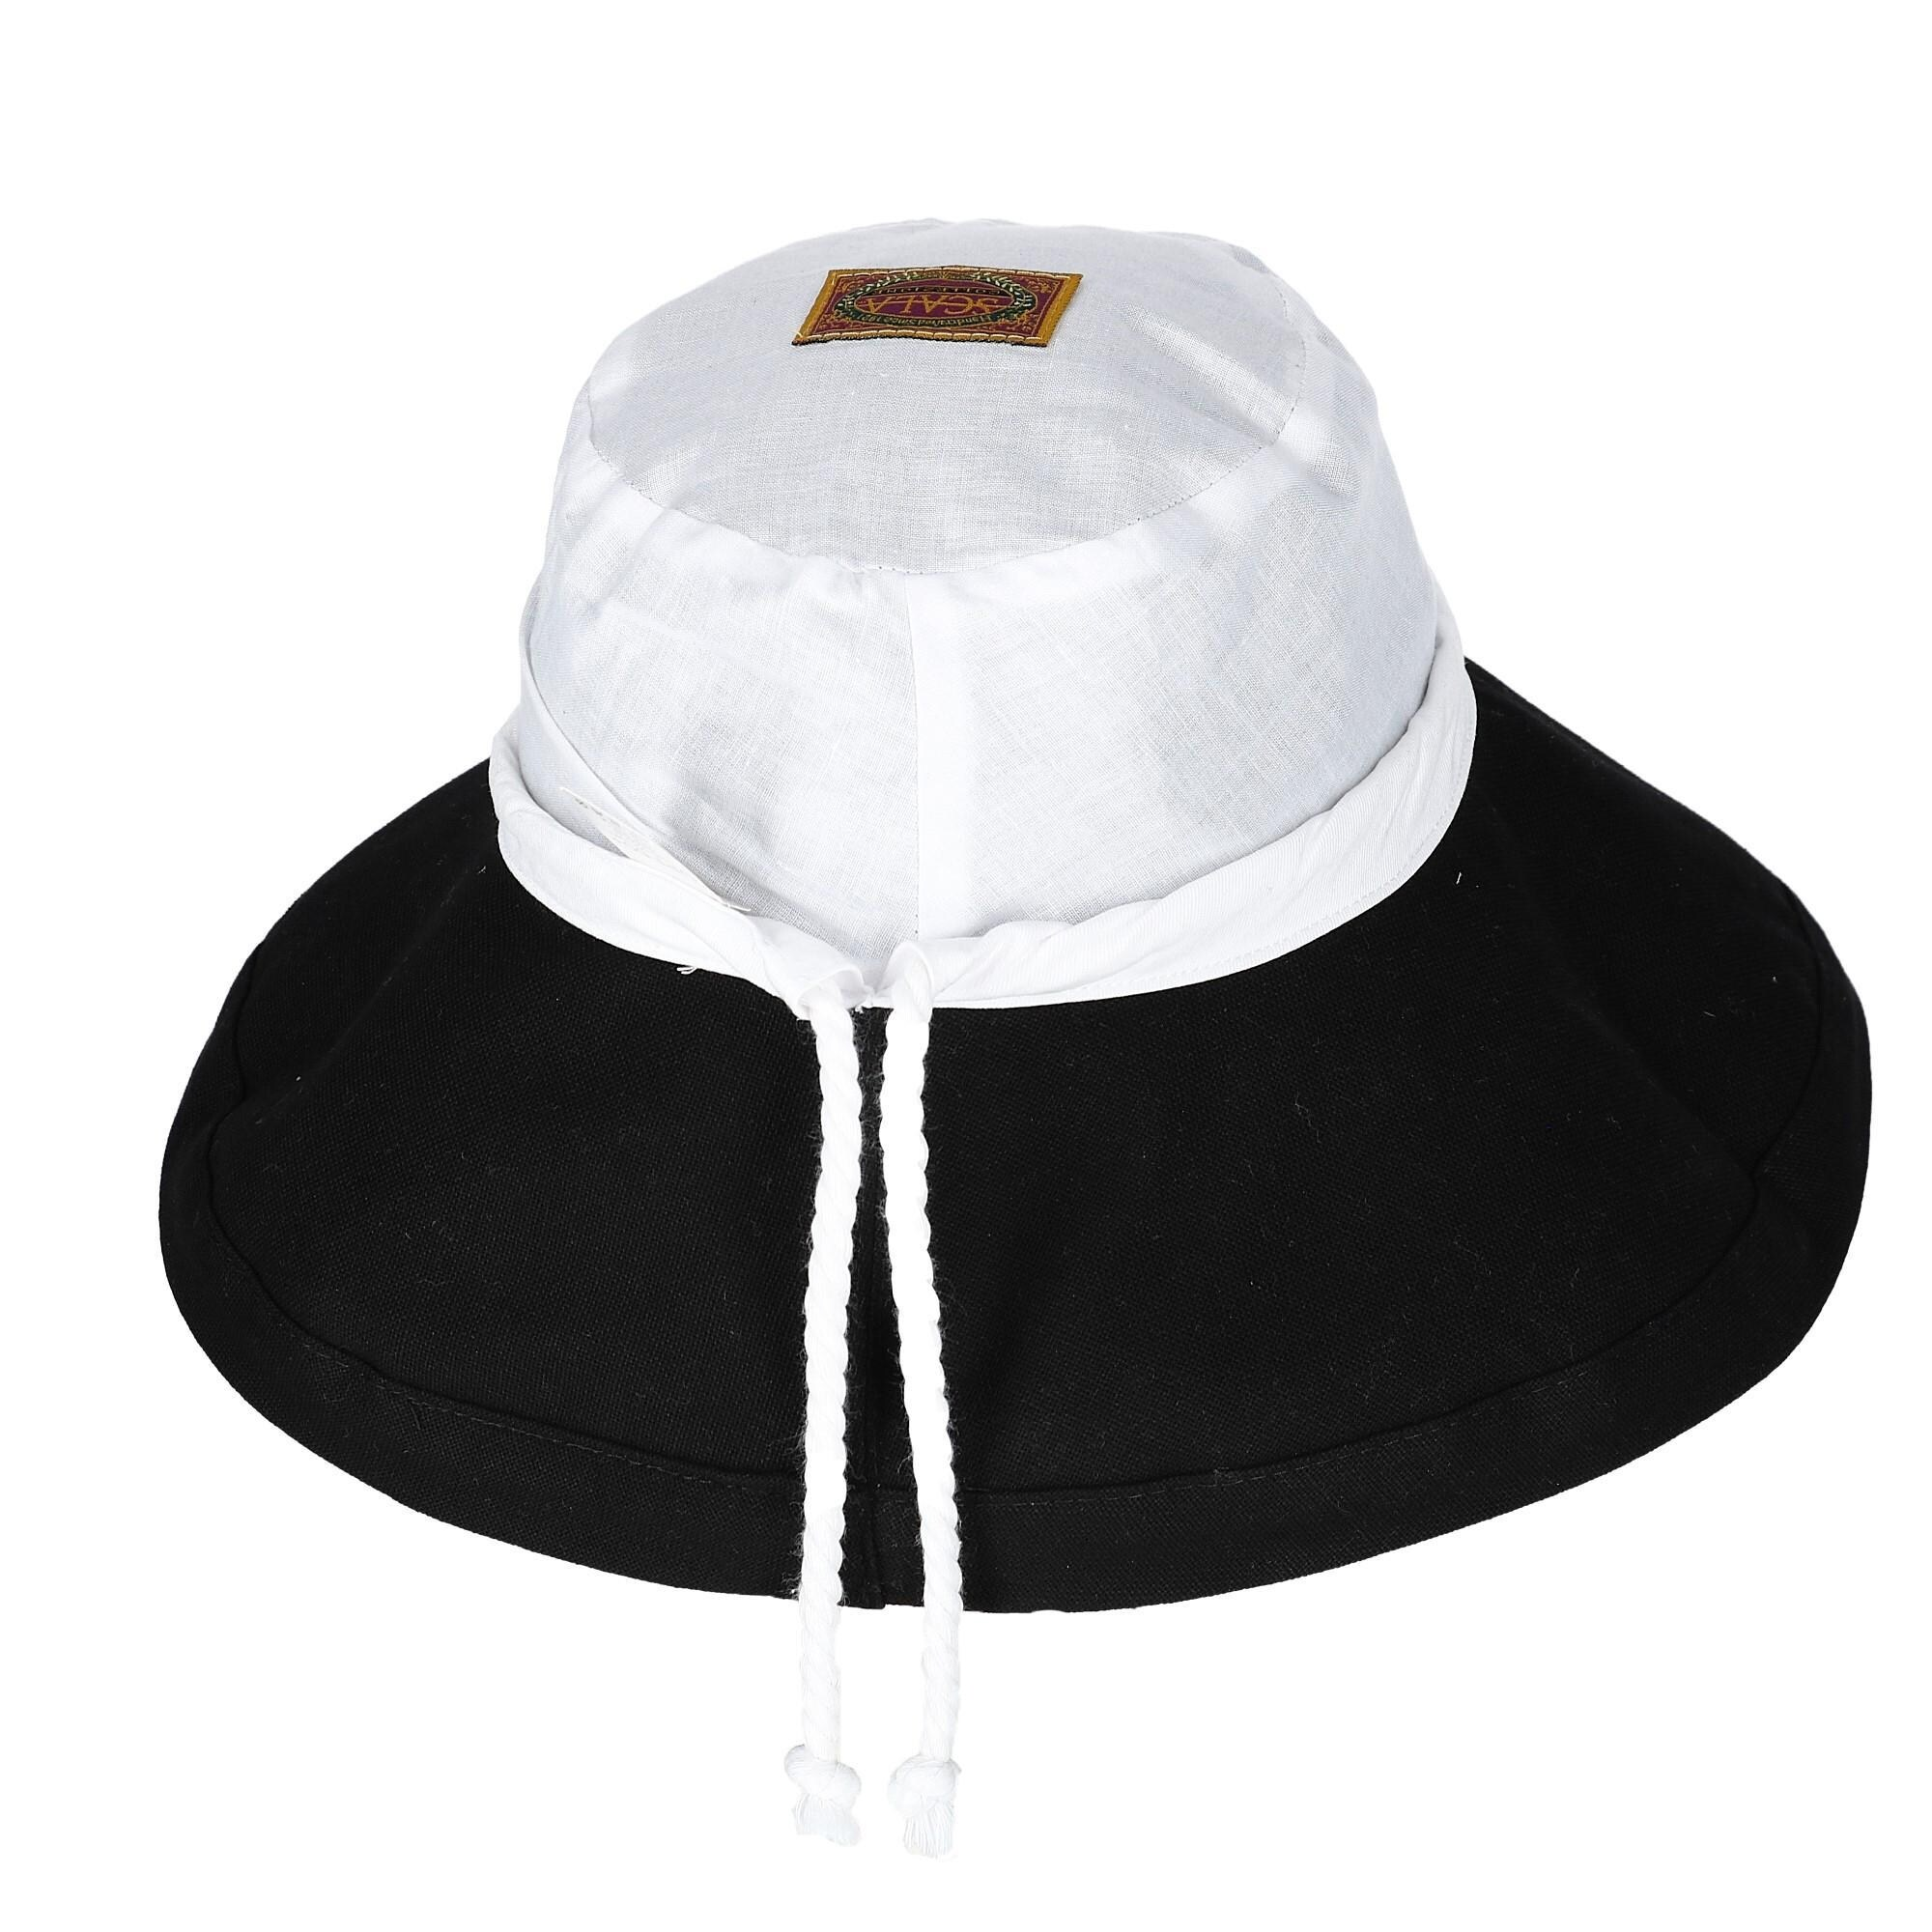 Shop Scala Women s Cotton 4 Inch Brim UPF 50+ Travel Sun Hat - Free  Shipping On Orders Over  45 - Overstock - 14281588 eeb26354e5f